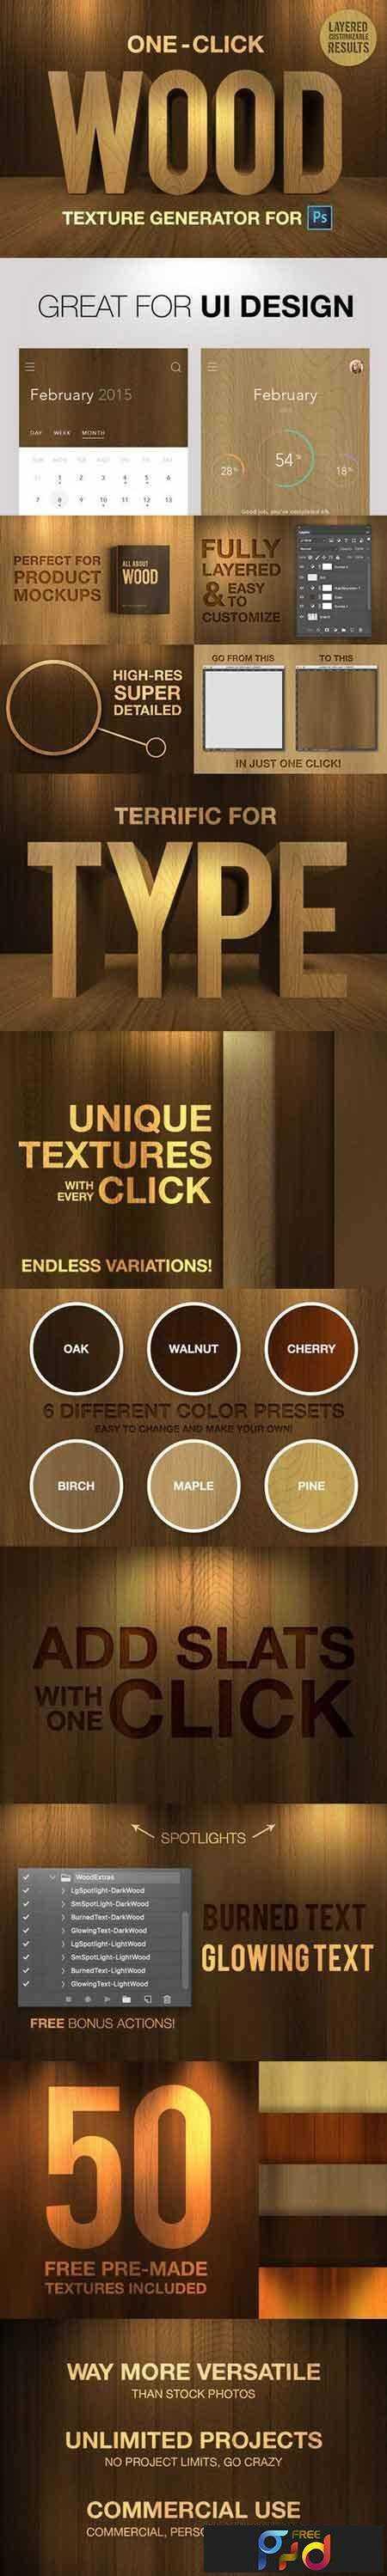 1804221 Wood Texture Generator - One Click 644331 - FreePSDvn